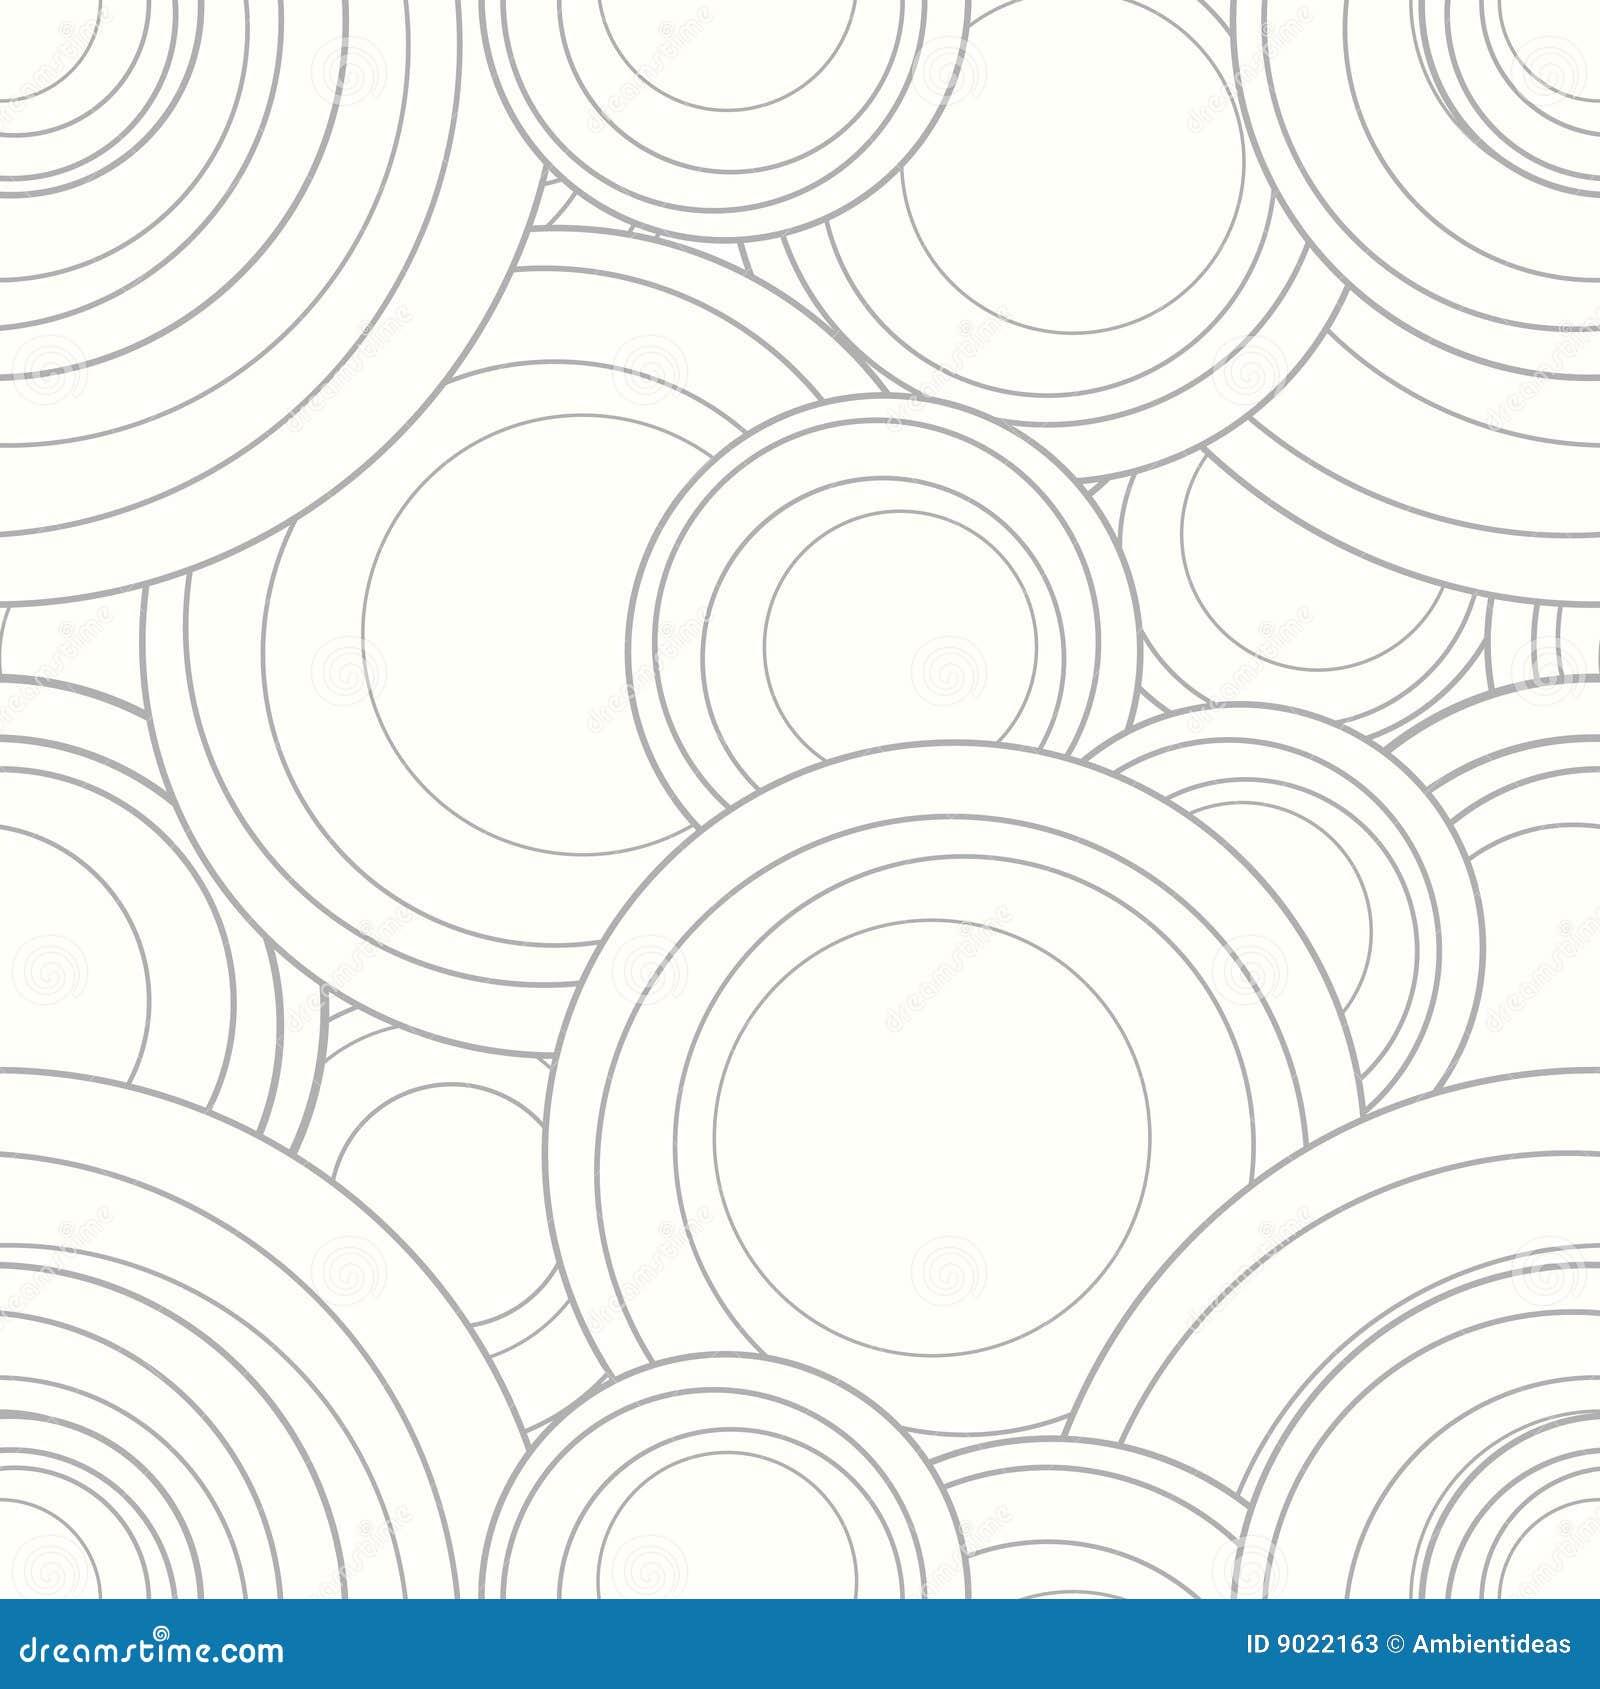 vector interlocking circles repeat tile pattern  stock photos